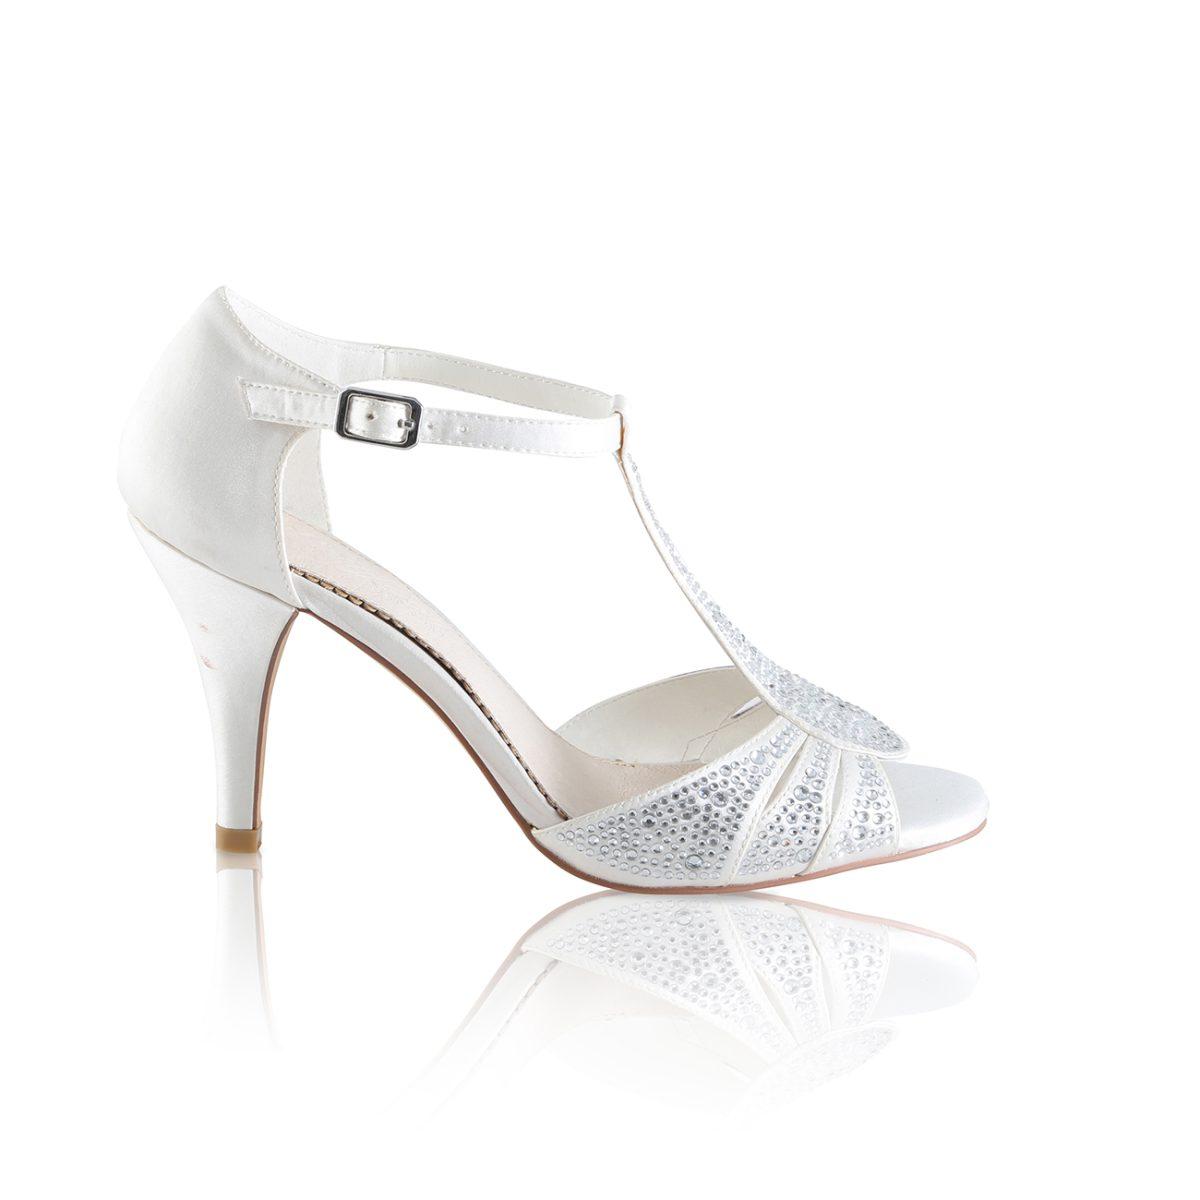 Perfect Bridal Perla Shoes - Ivory Satin